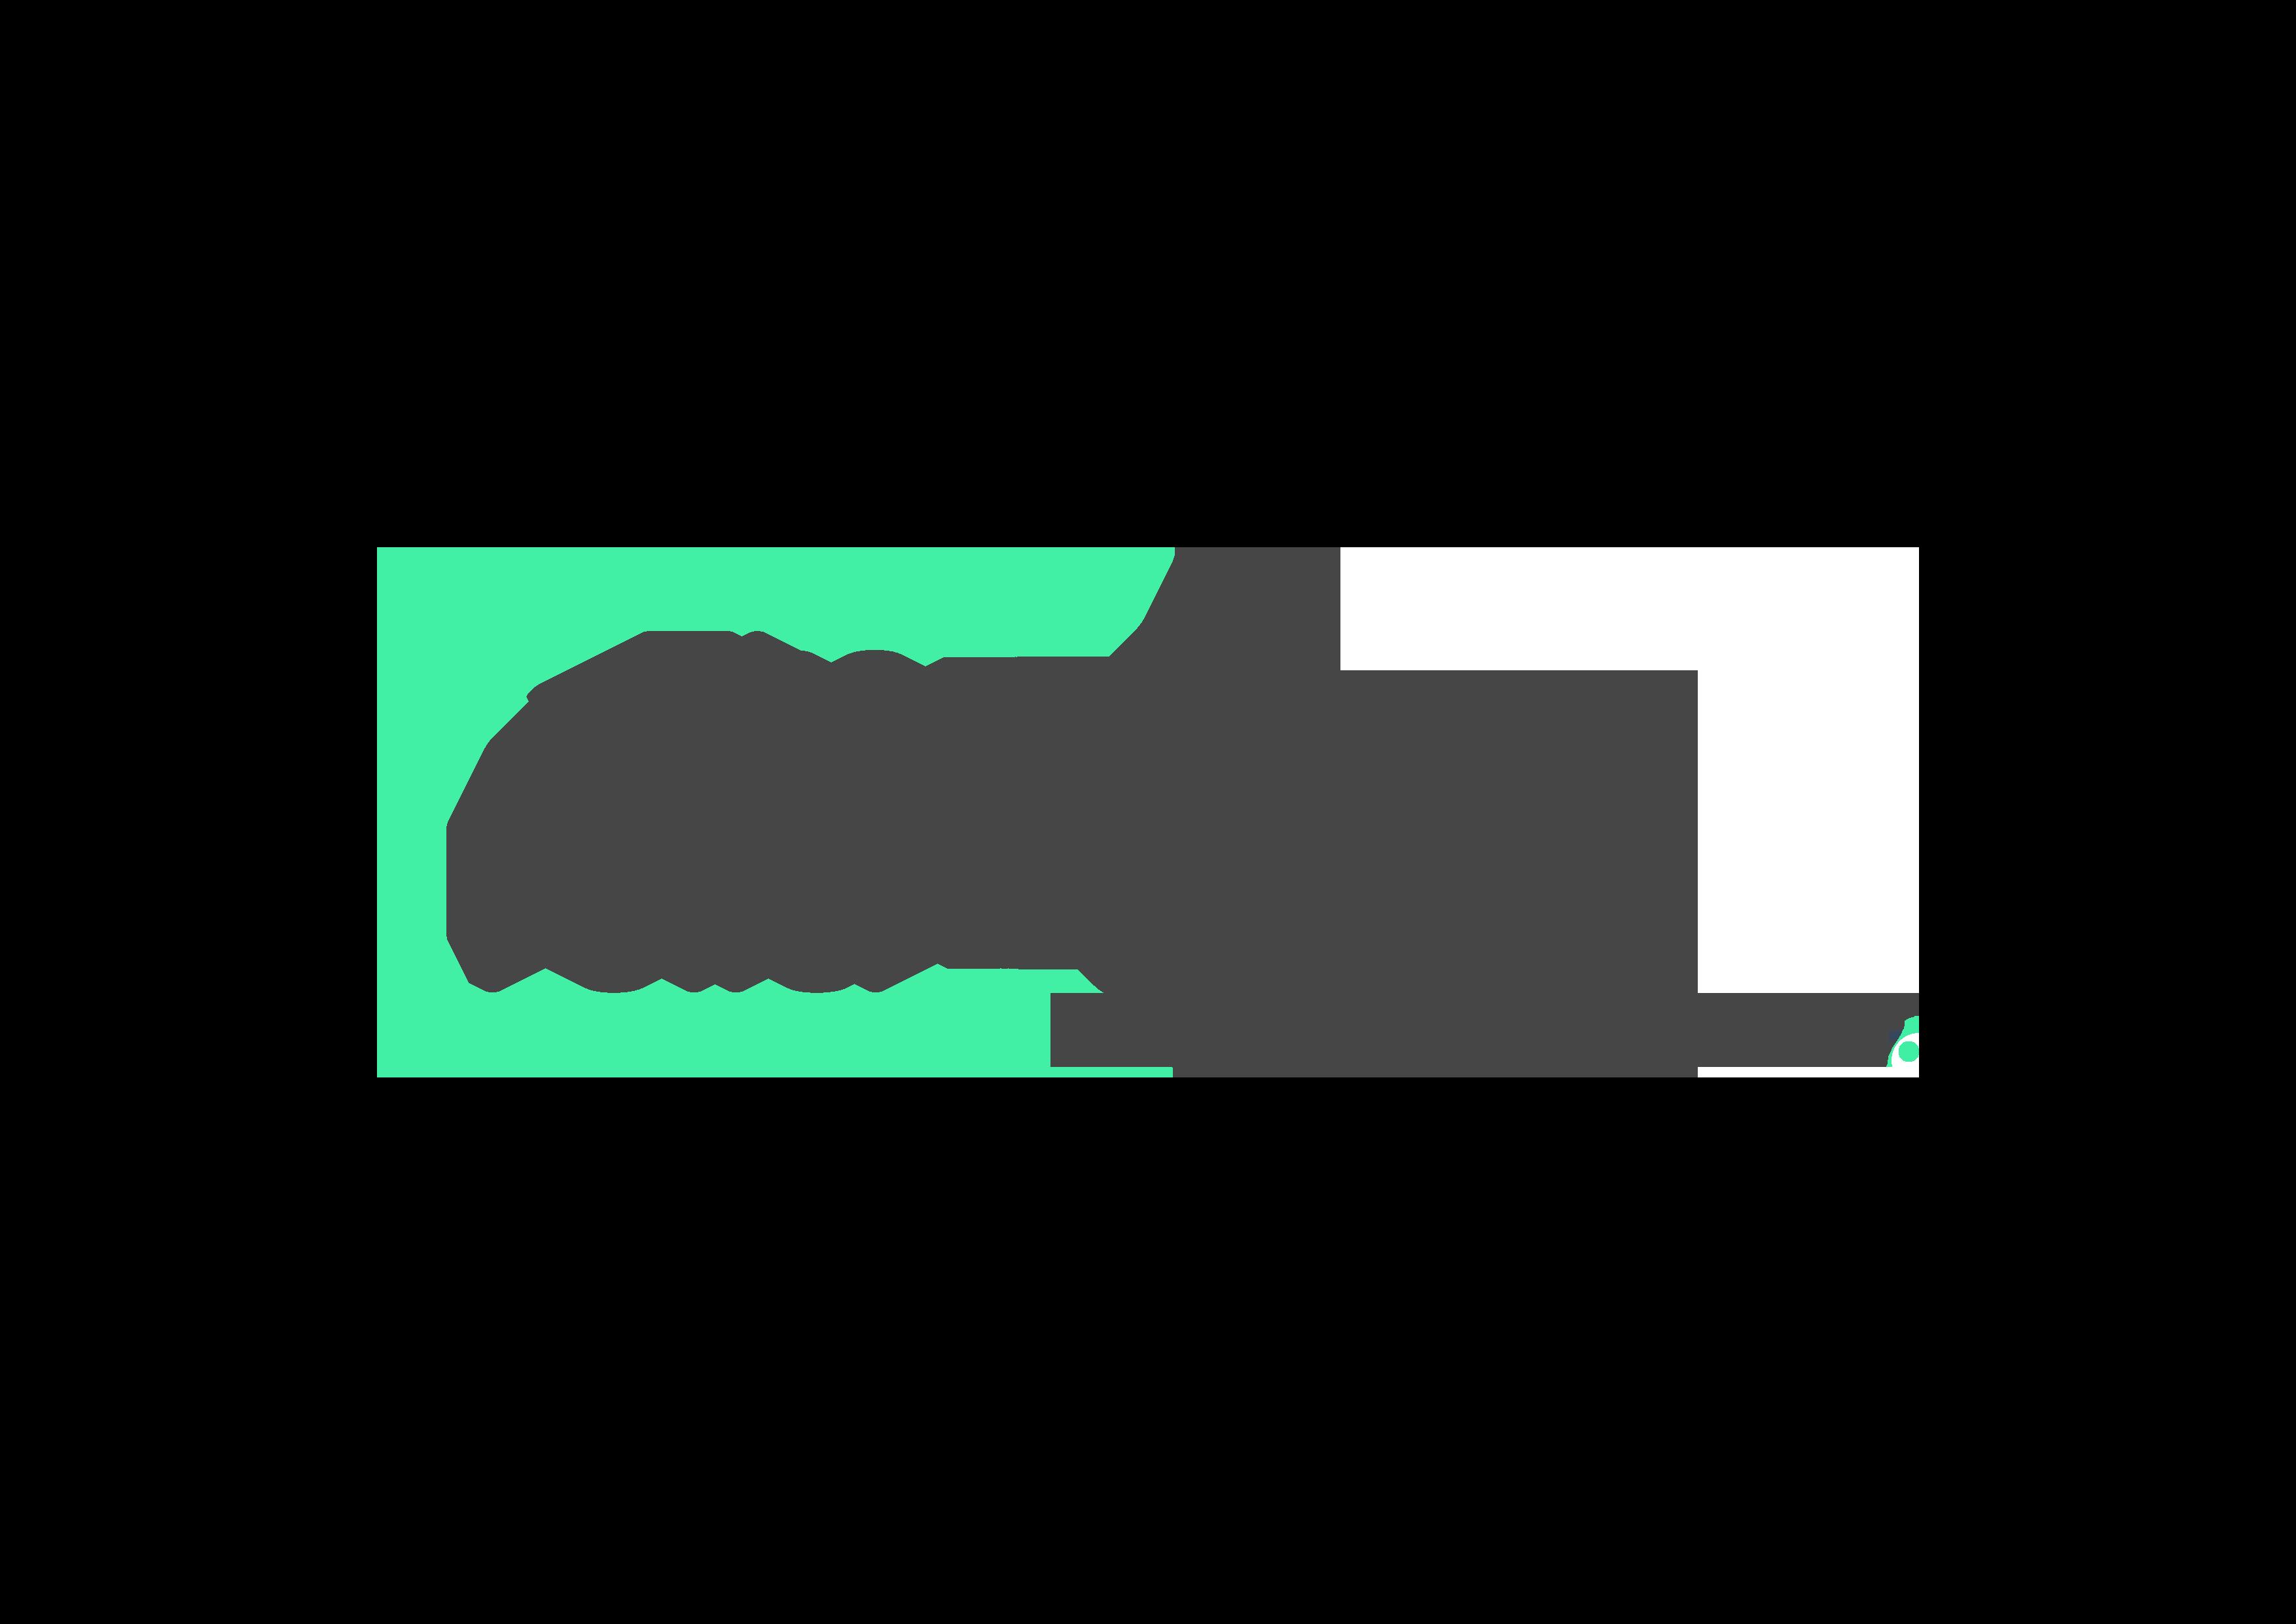 logo thepowermba + power digital marketing